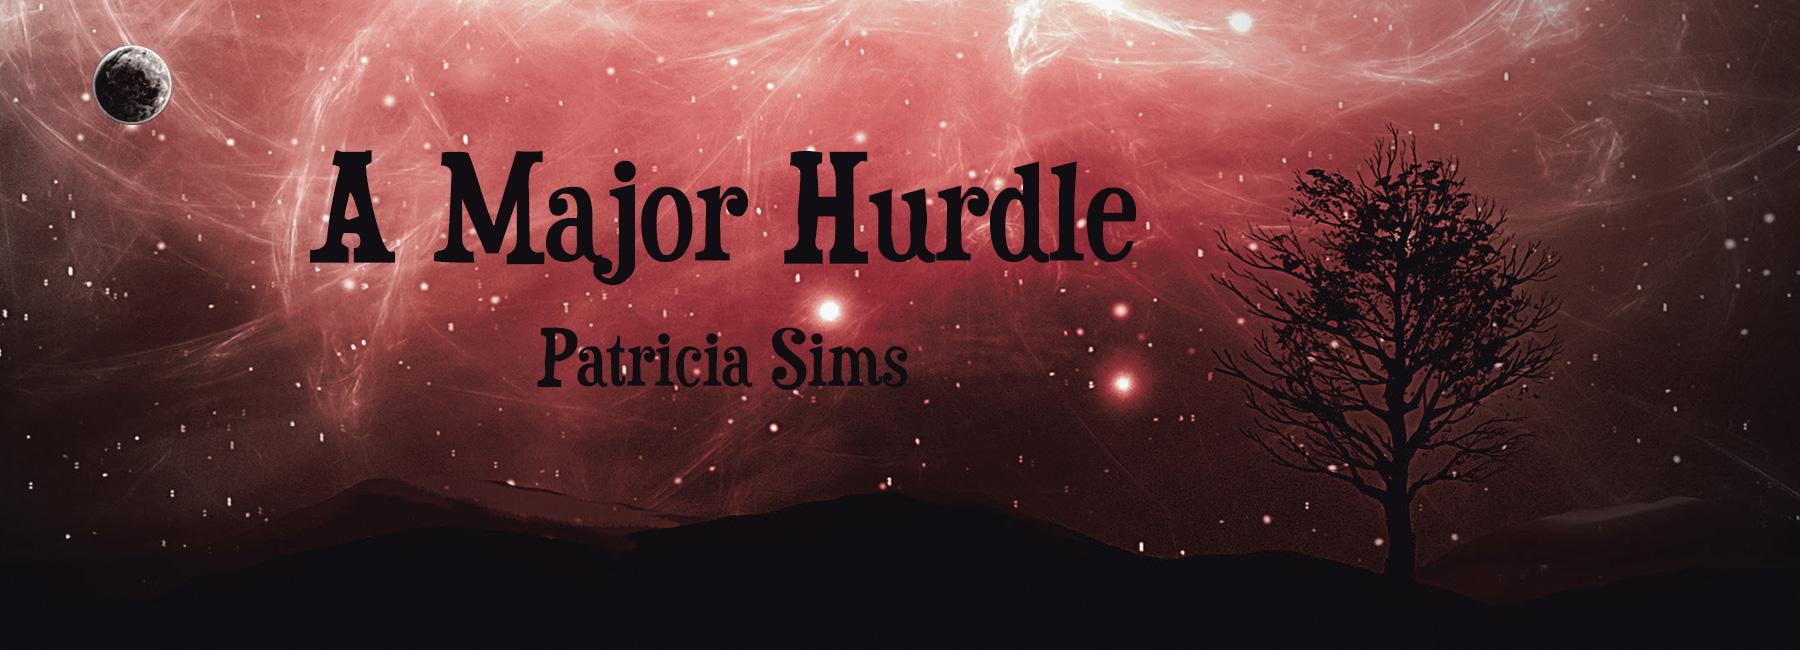 A Major Hurdle - Patricia Sims | HOME